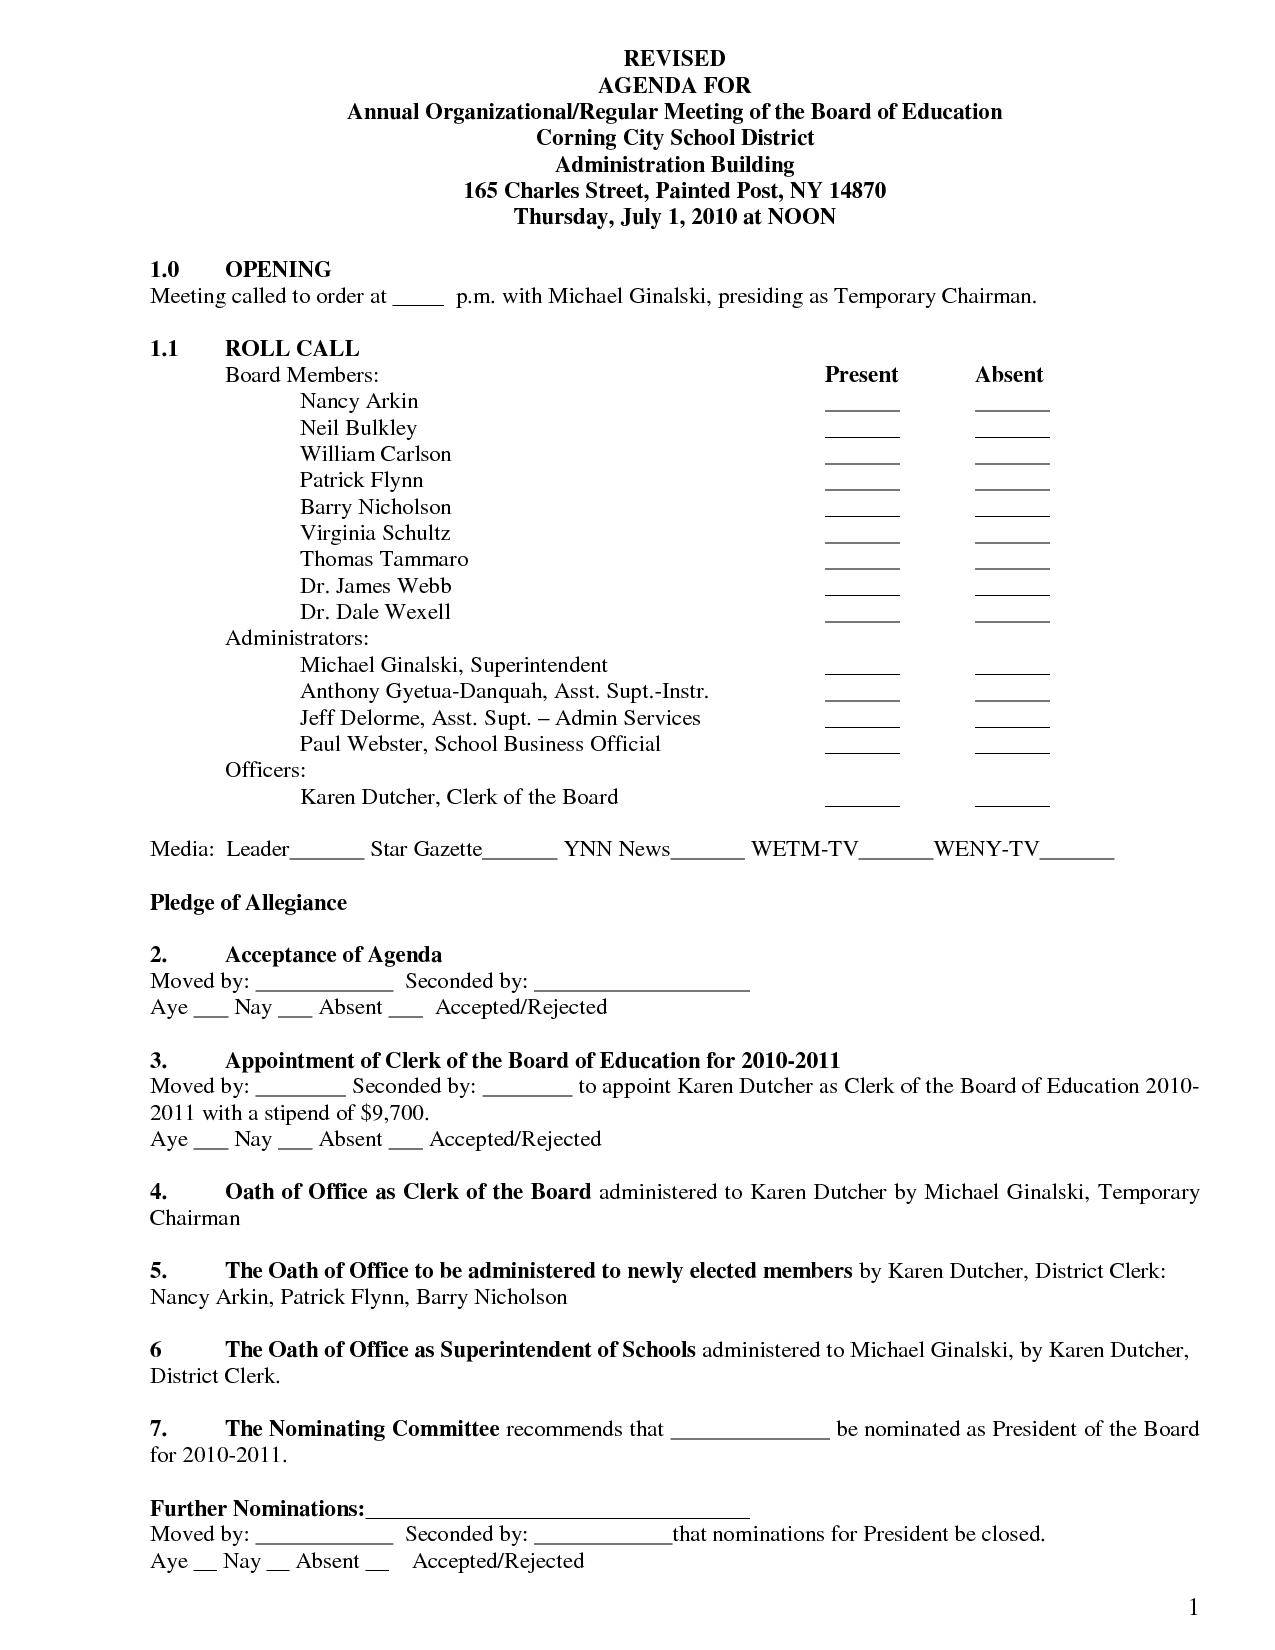 Hoa Board Of Directors Meeting Agenda Template